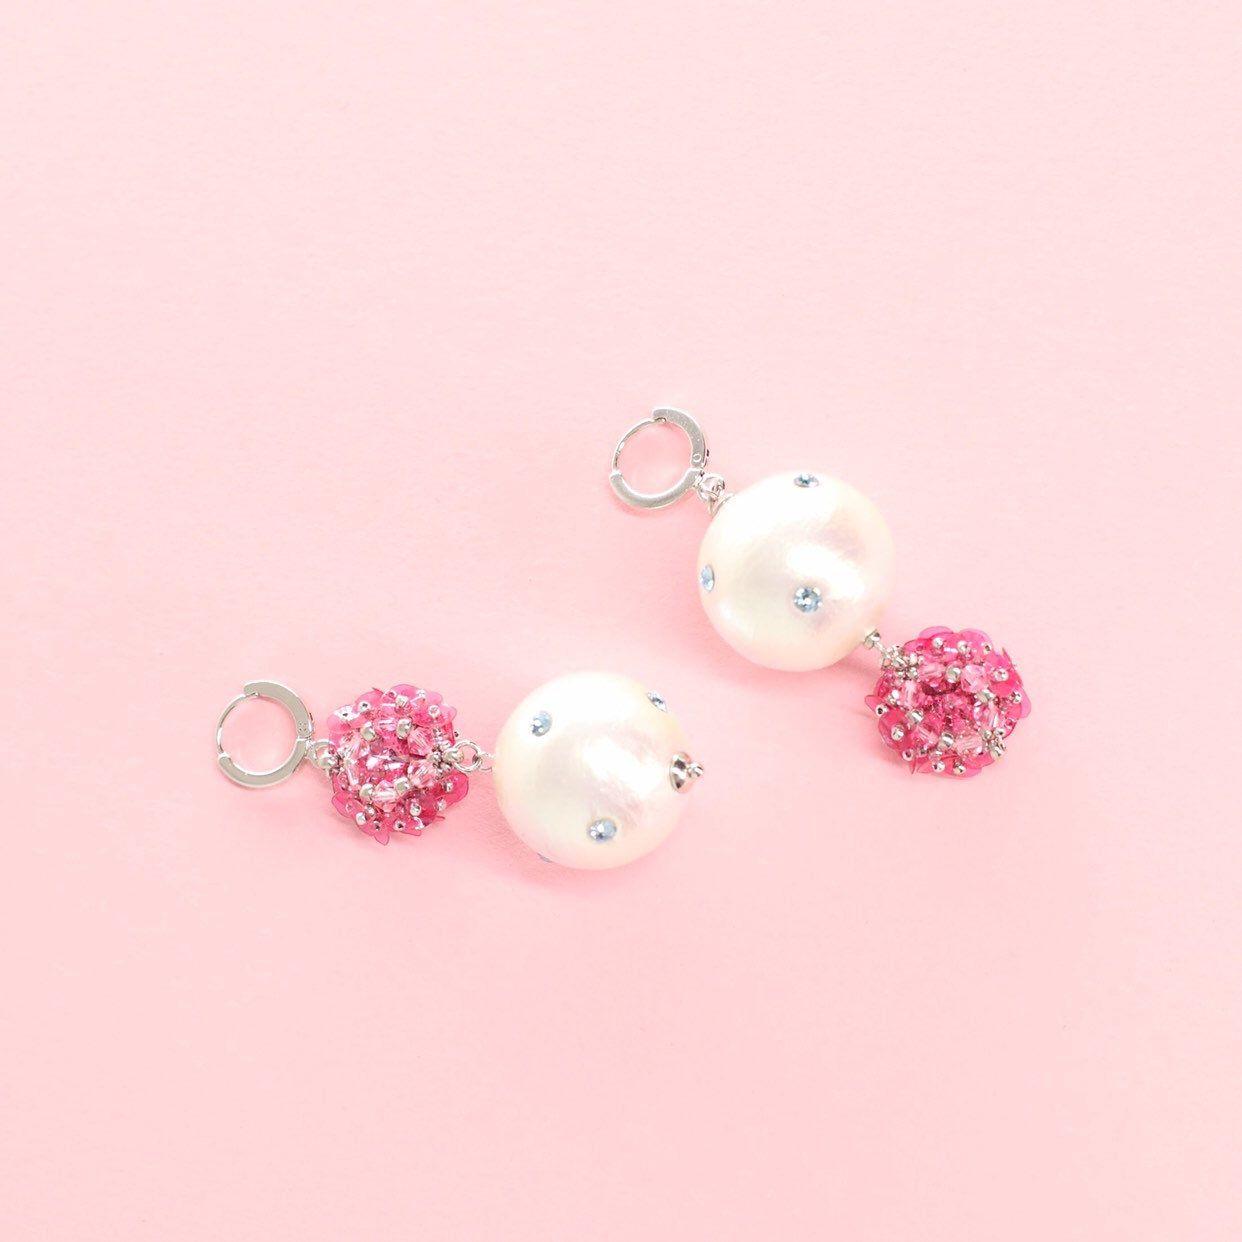 Large Pearl Drop Earrings By Olgakaraulova Pink And White Asymmetric Earrings Mismatch Sequins Faux Pearl Earrings Stilnaya Bizhuteriya Modnye Sergi Sergi